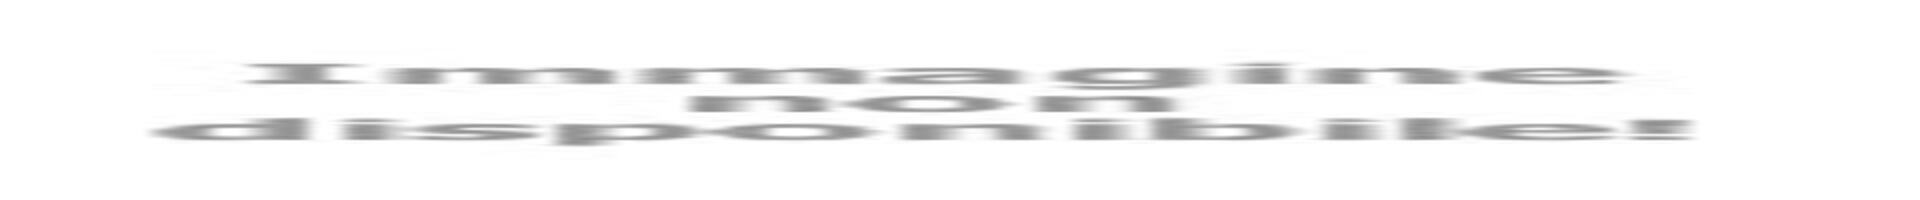 blumenhotel en april-and-may-in-rimini-in-seaside-hotel 015